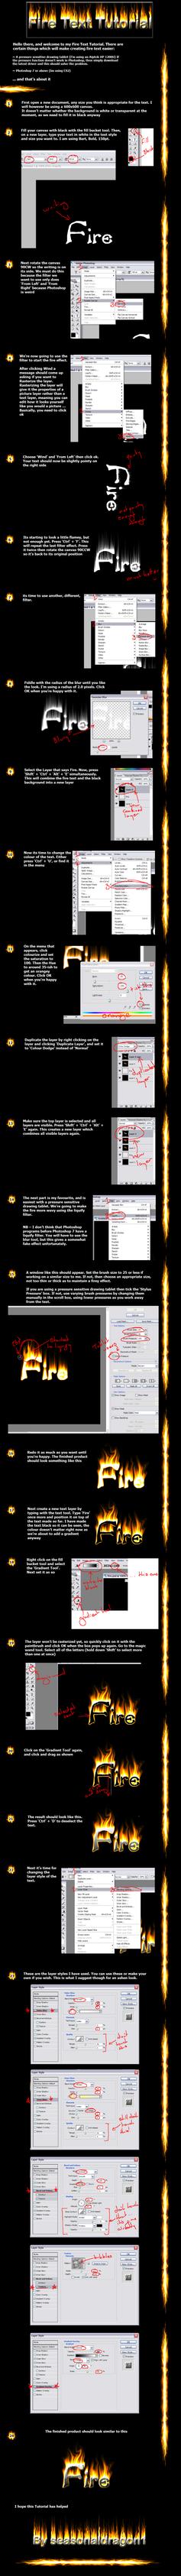 .: Fire Text tutorial :. by seasonaldragon1